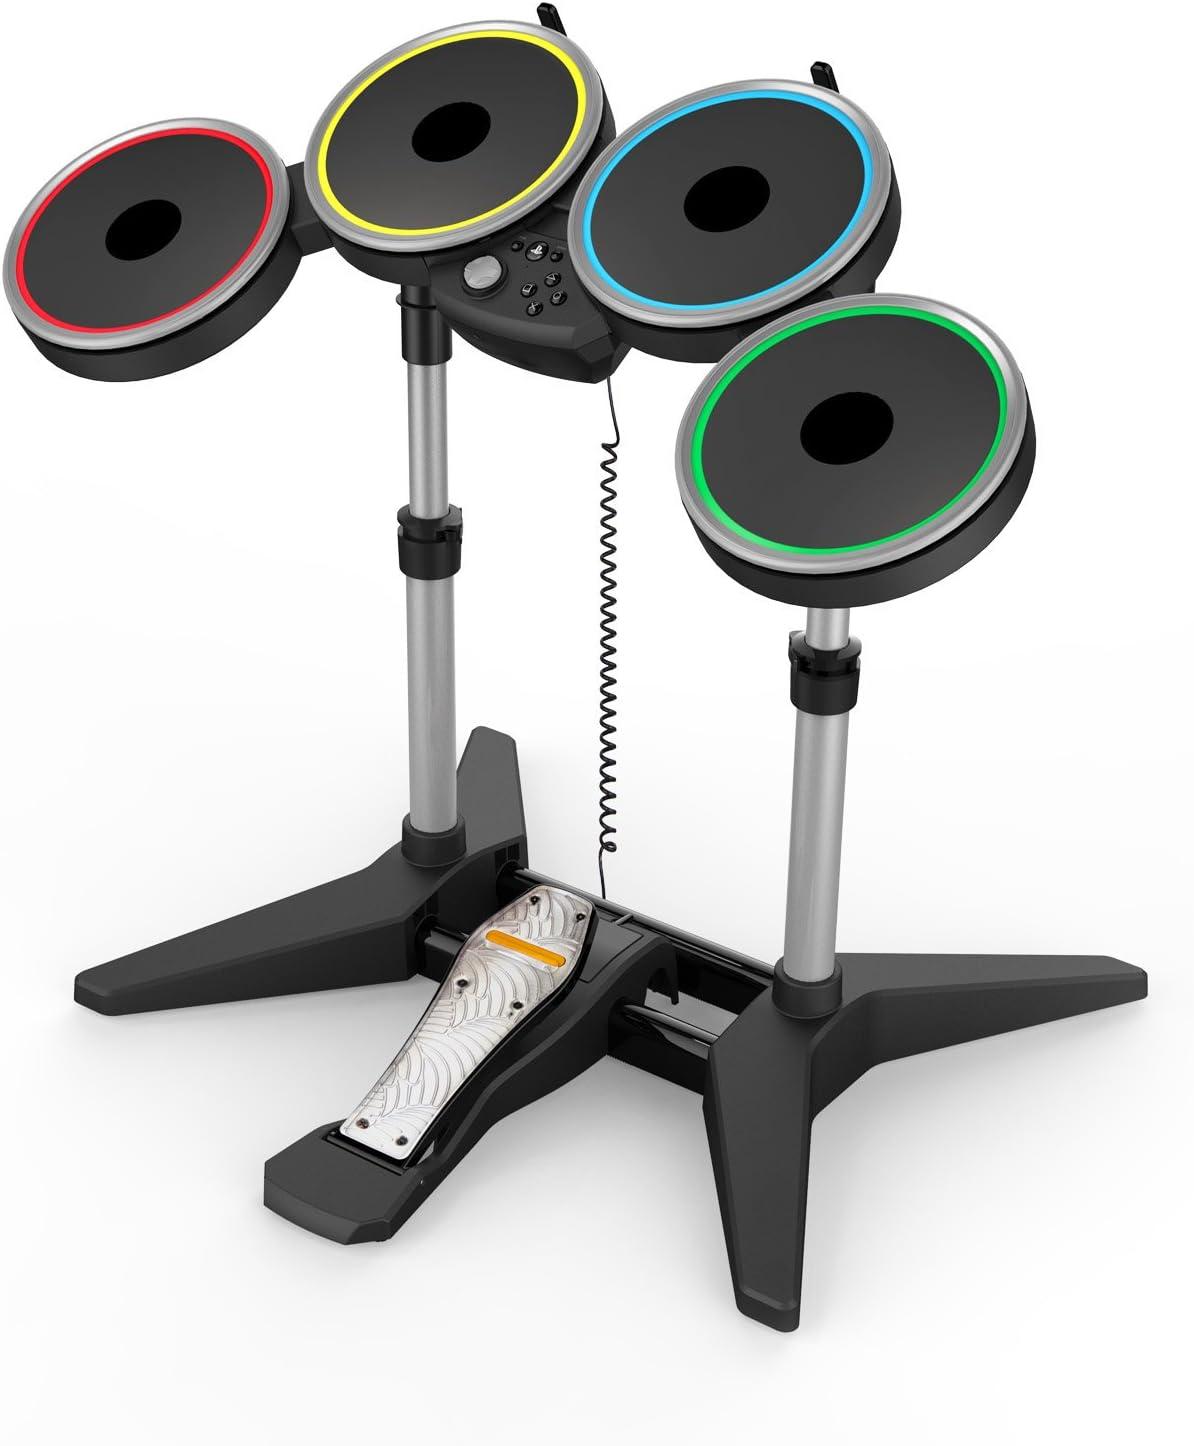 Amazon com: Rock Band 4 Band-in-a-Box Bundle - PlayStation 4